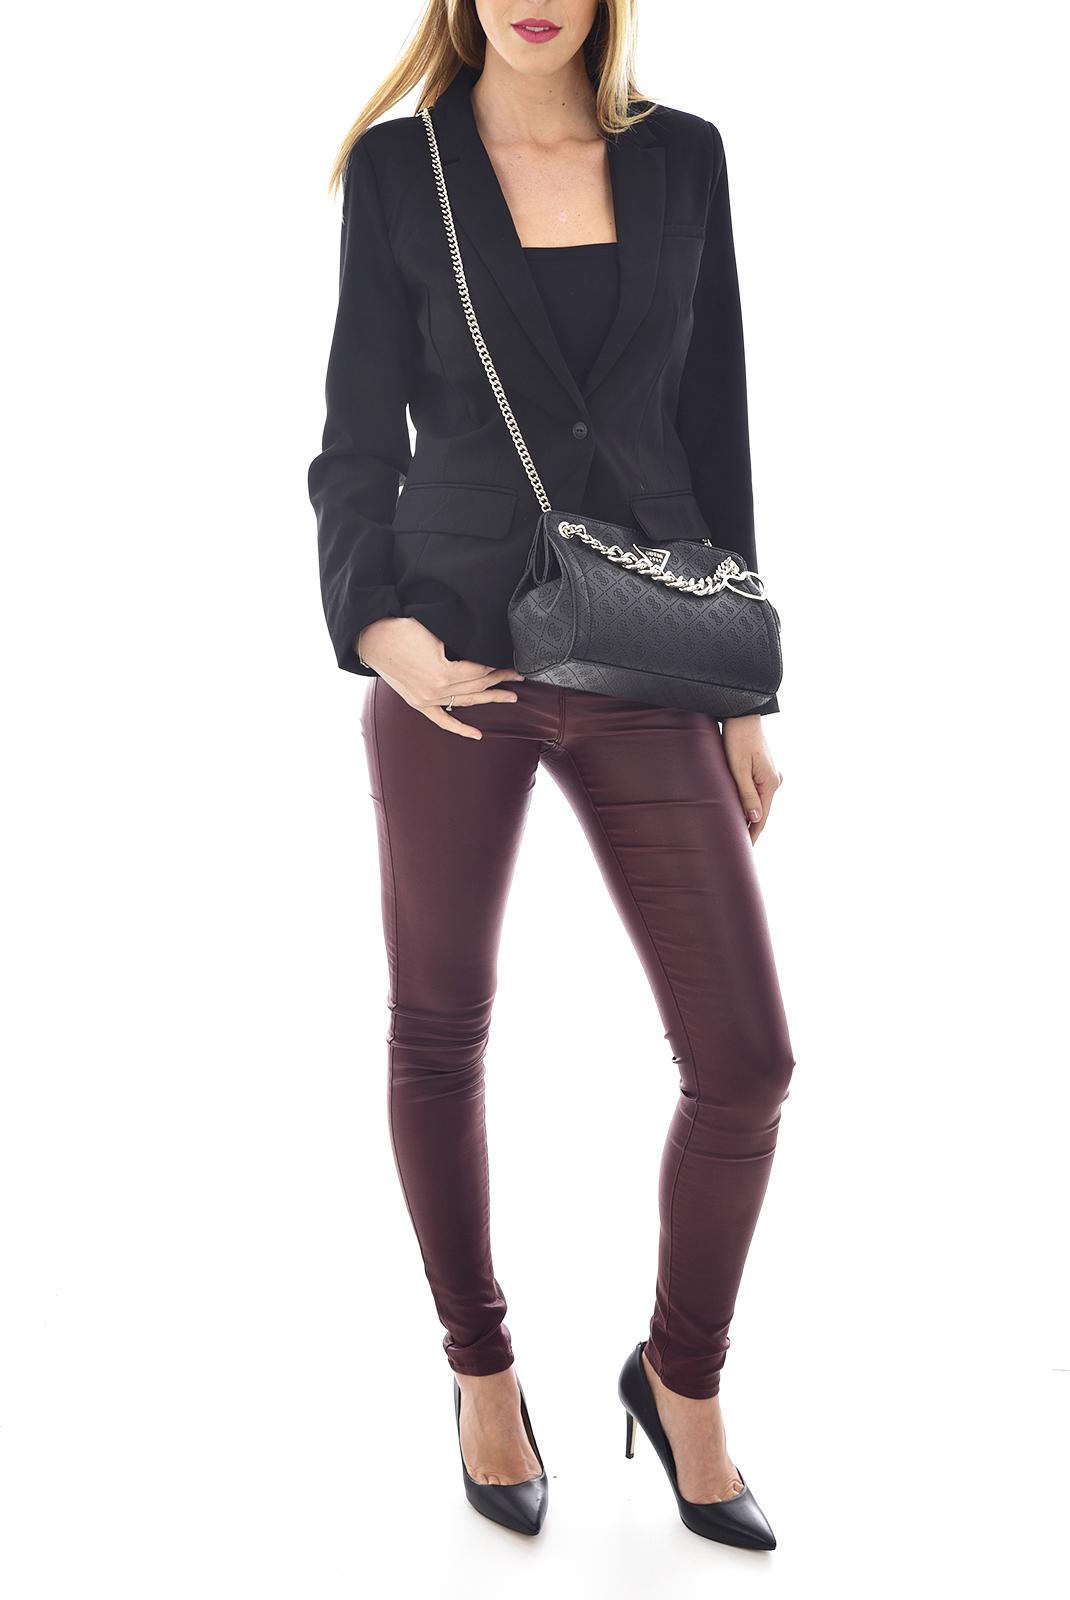 Besaces / Sacs bandoulière  Guess jeans HWSG71 00350 LYRA BLACK